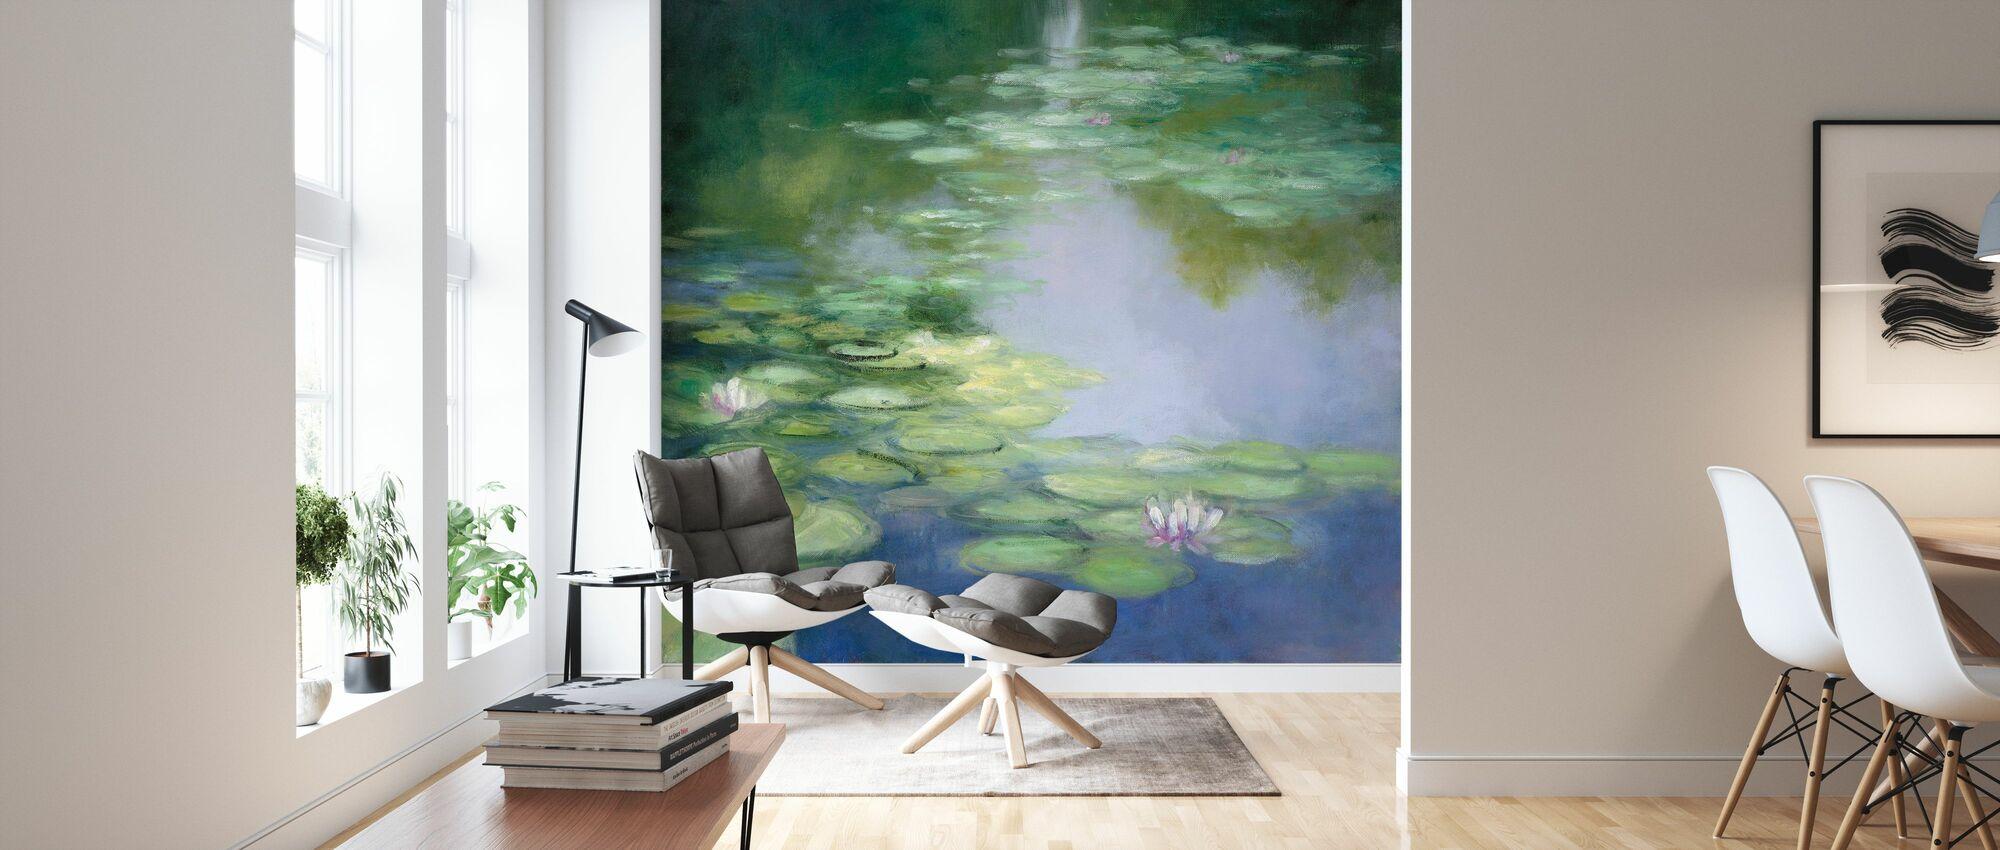 Blue Lily I - Wallpaper - Living Room